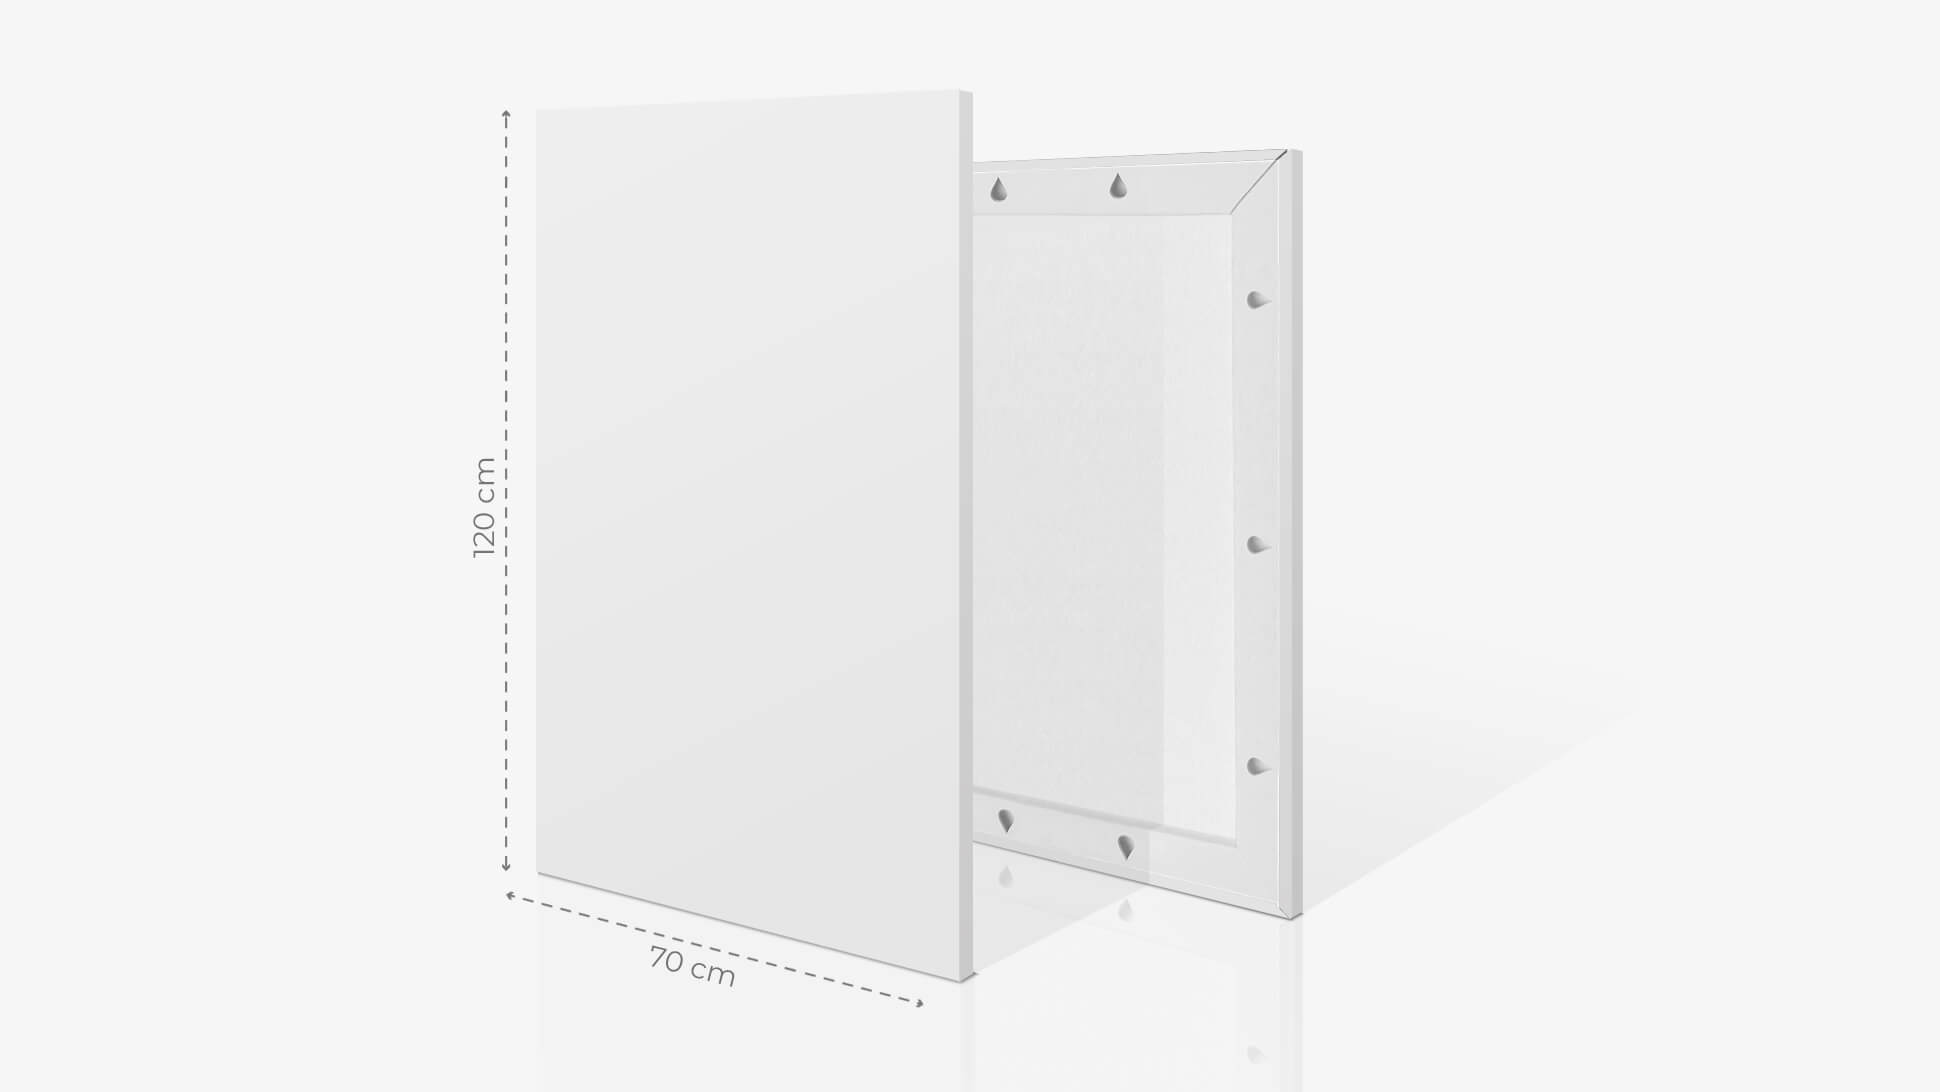 Fotoquadro 70x120 cm | tictac.it